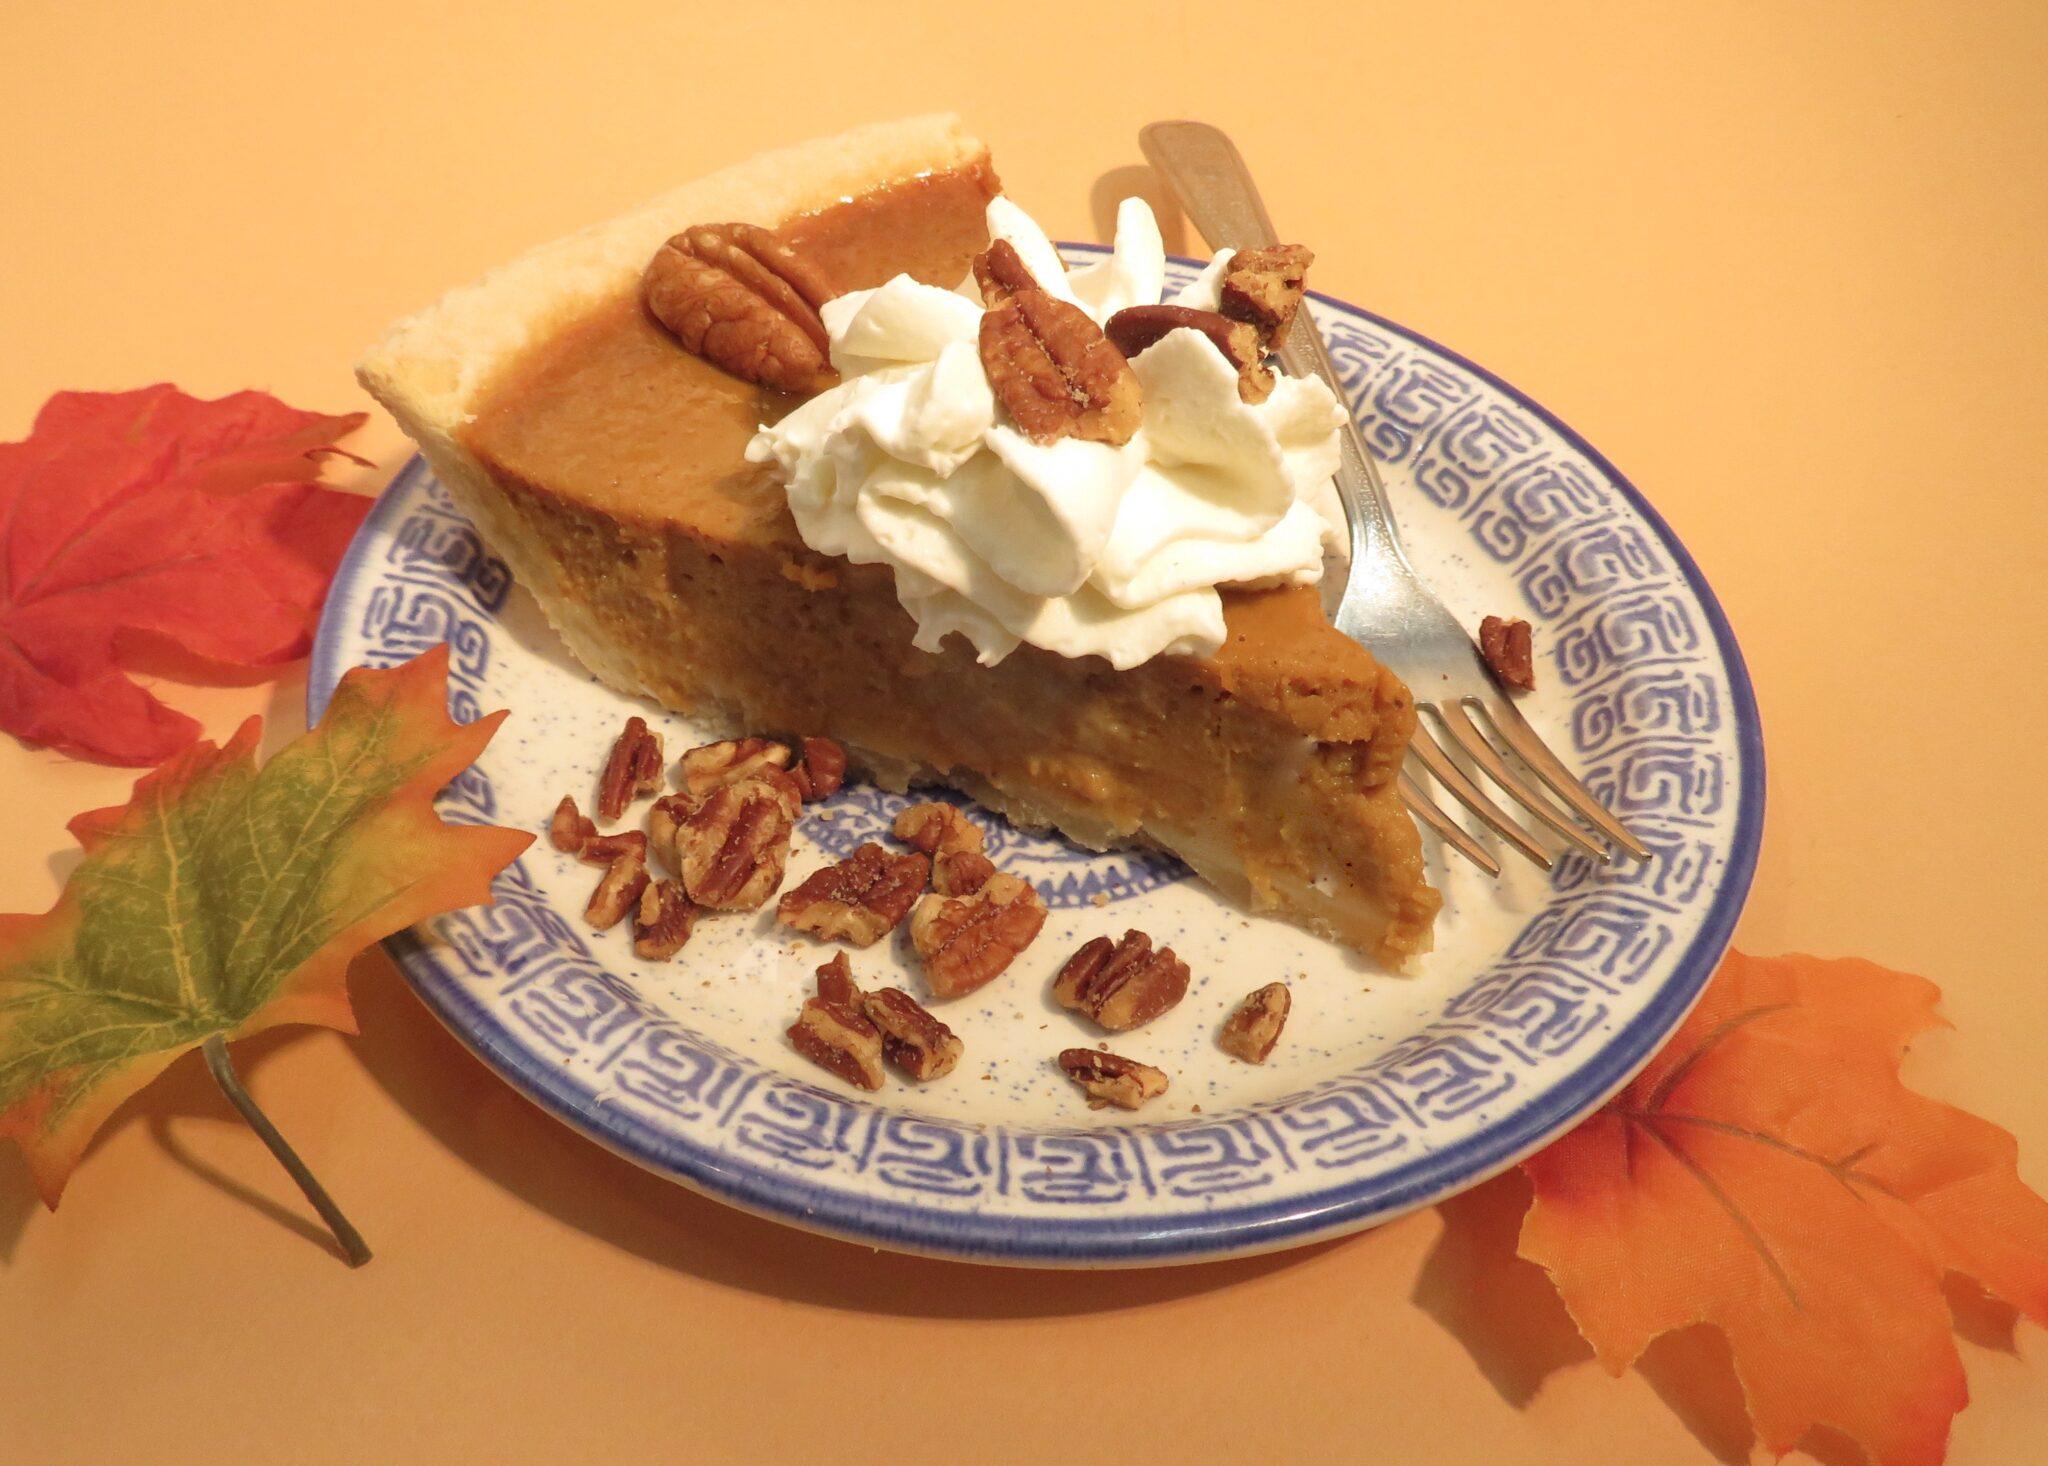 Delicious piece of home made Pumpkin Pie